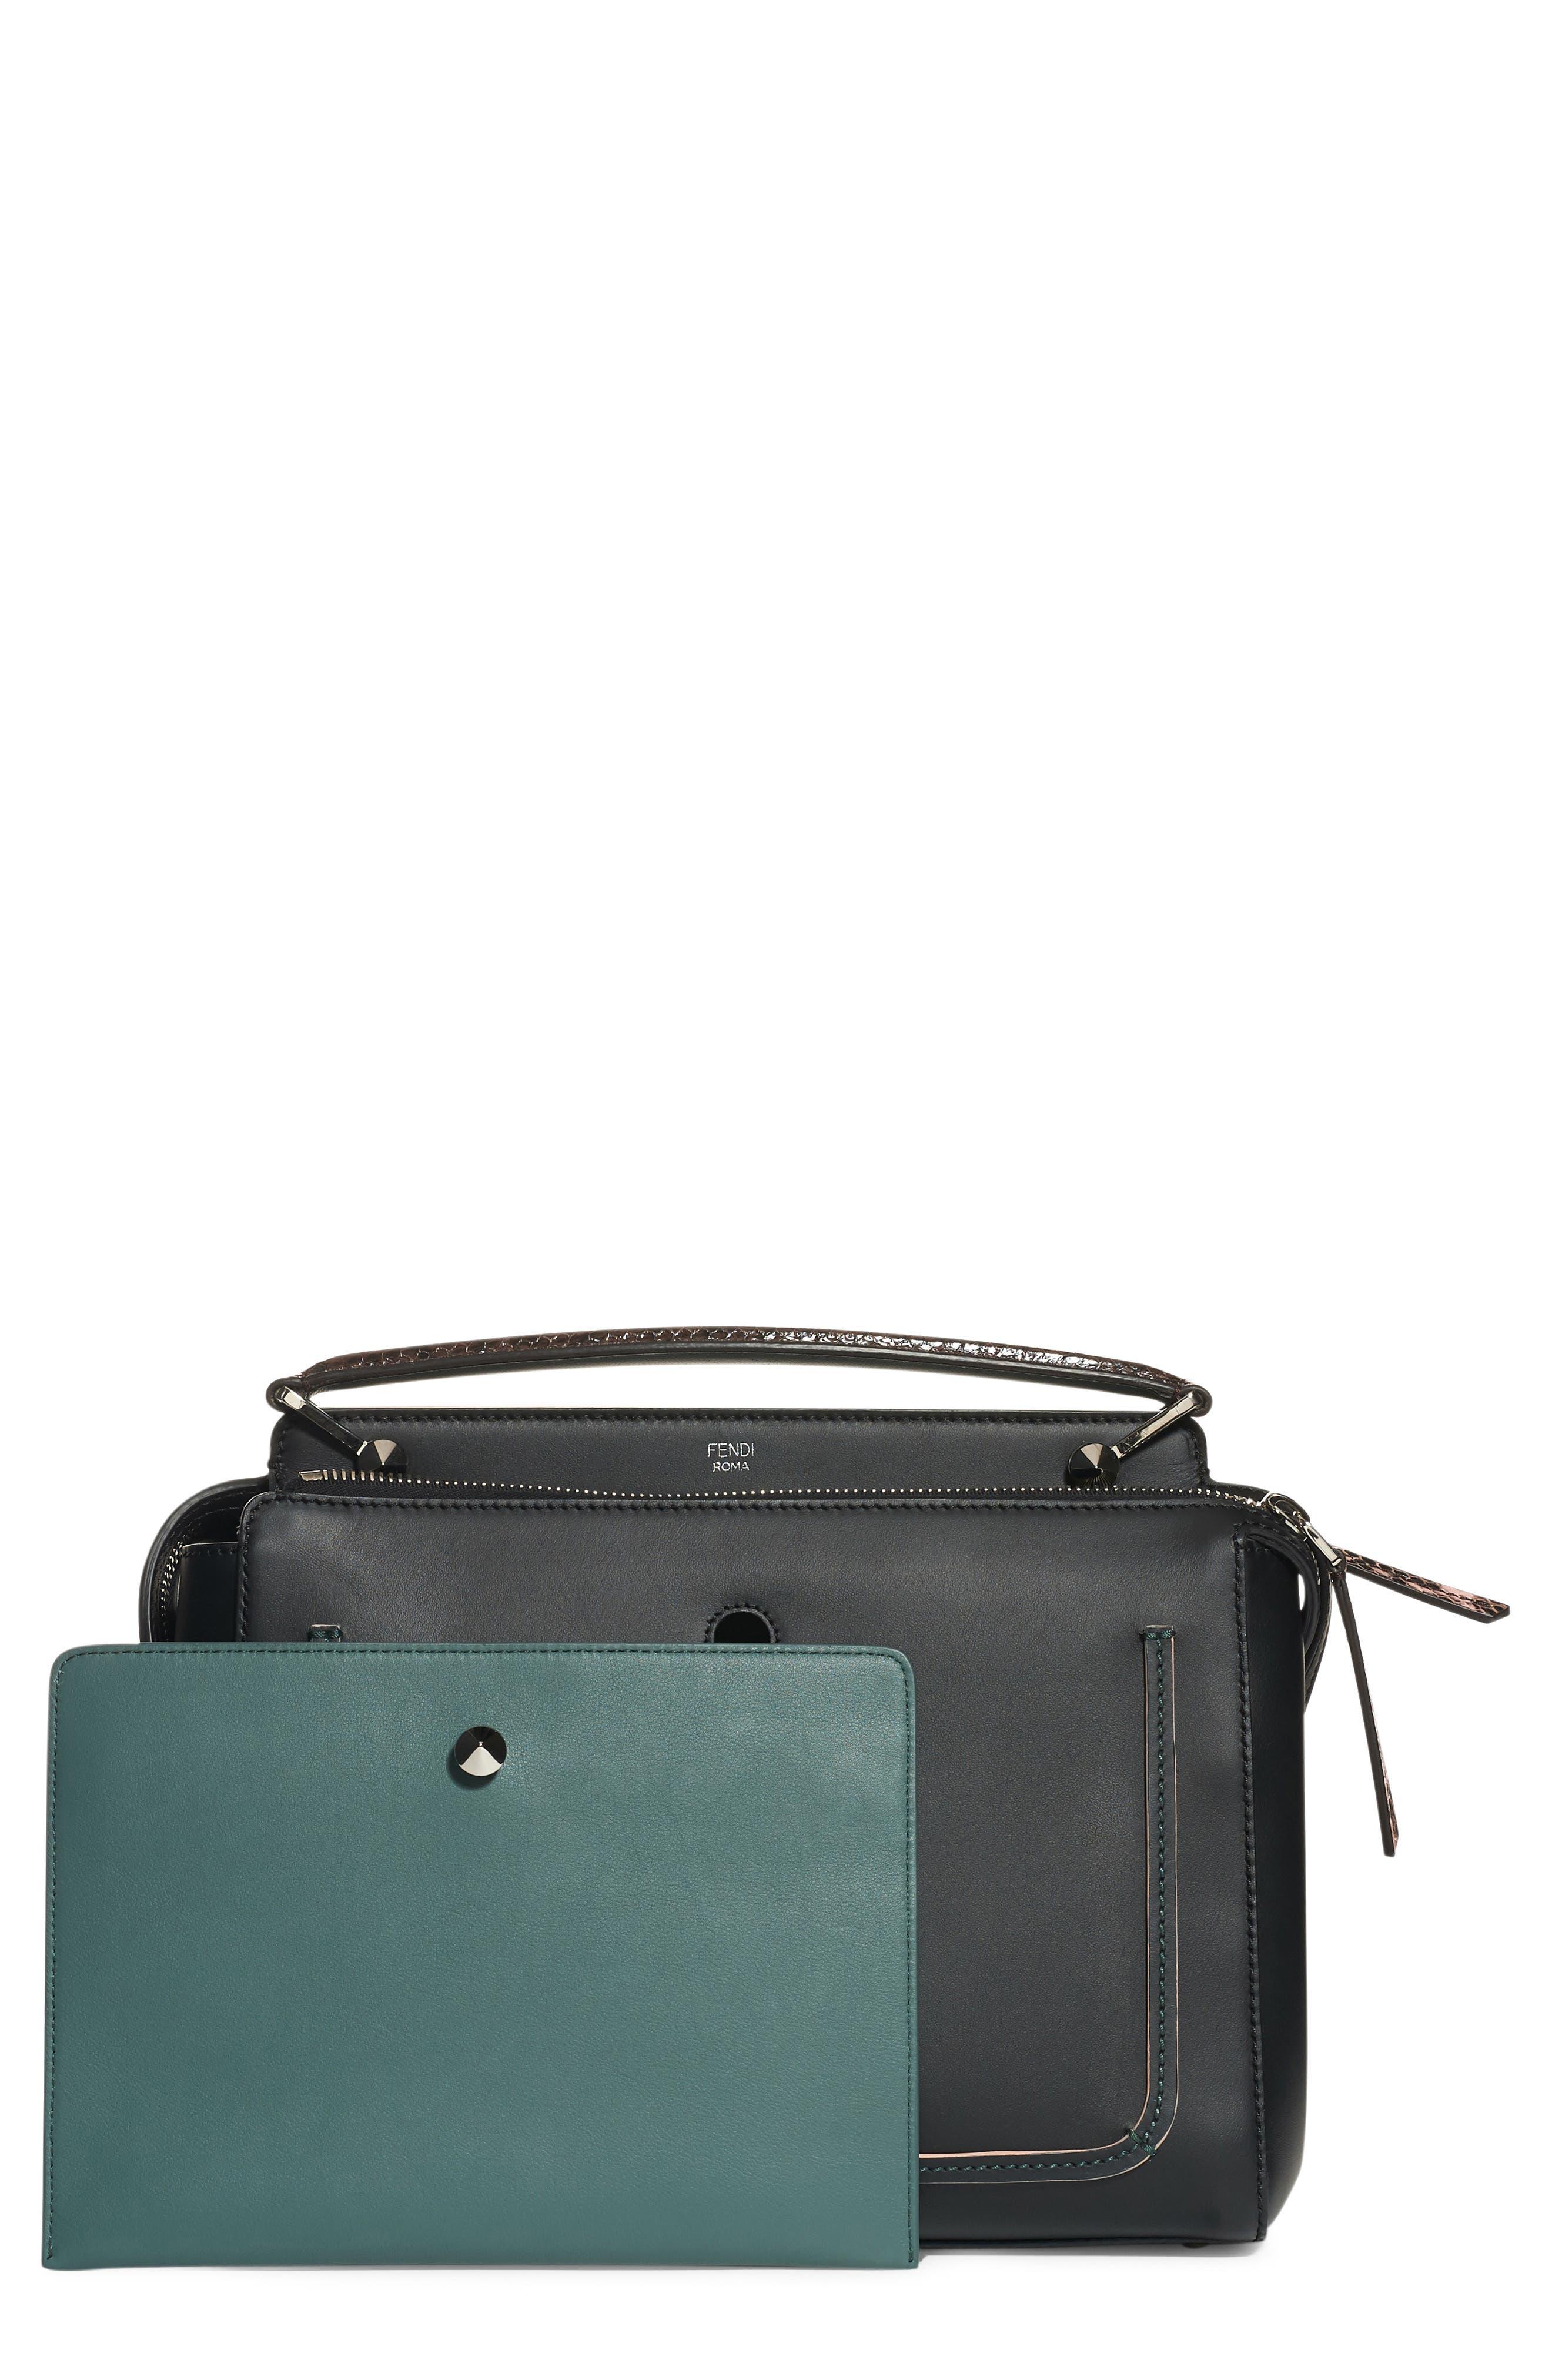 Fendi 'DOTCOM' Leather & Genuine Snakeskin Satchel